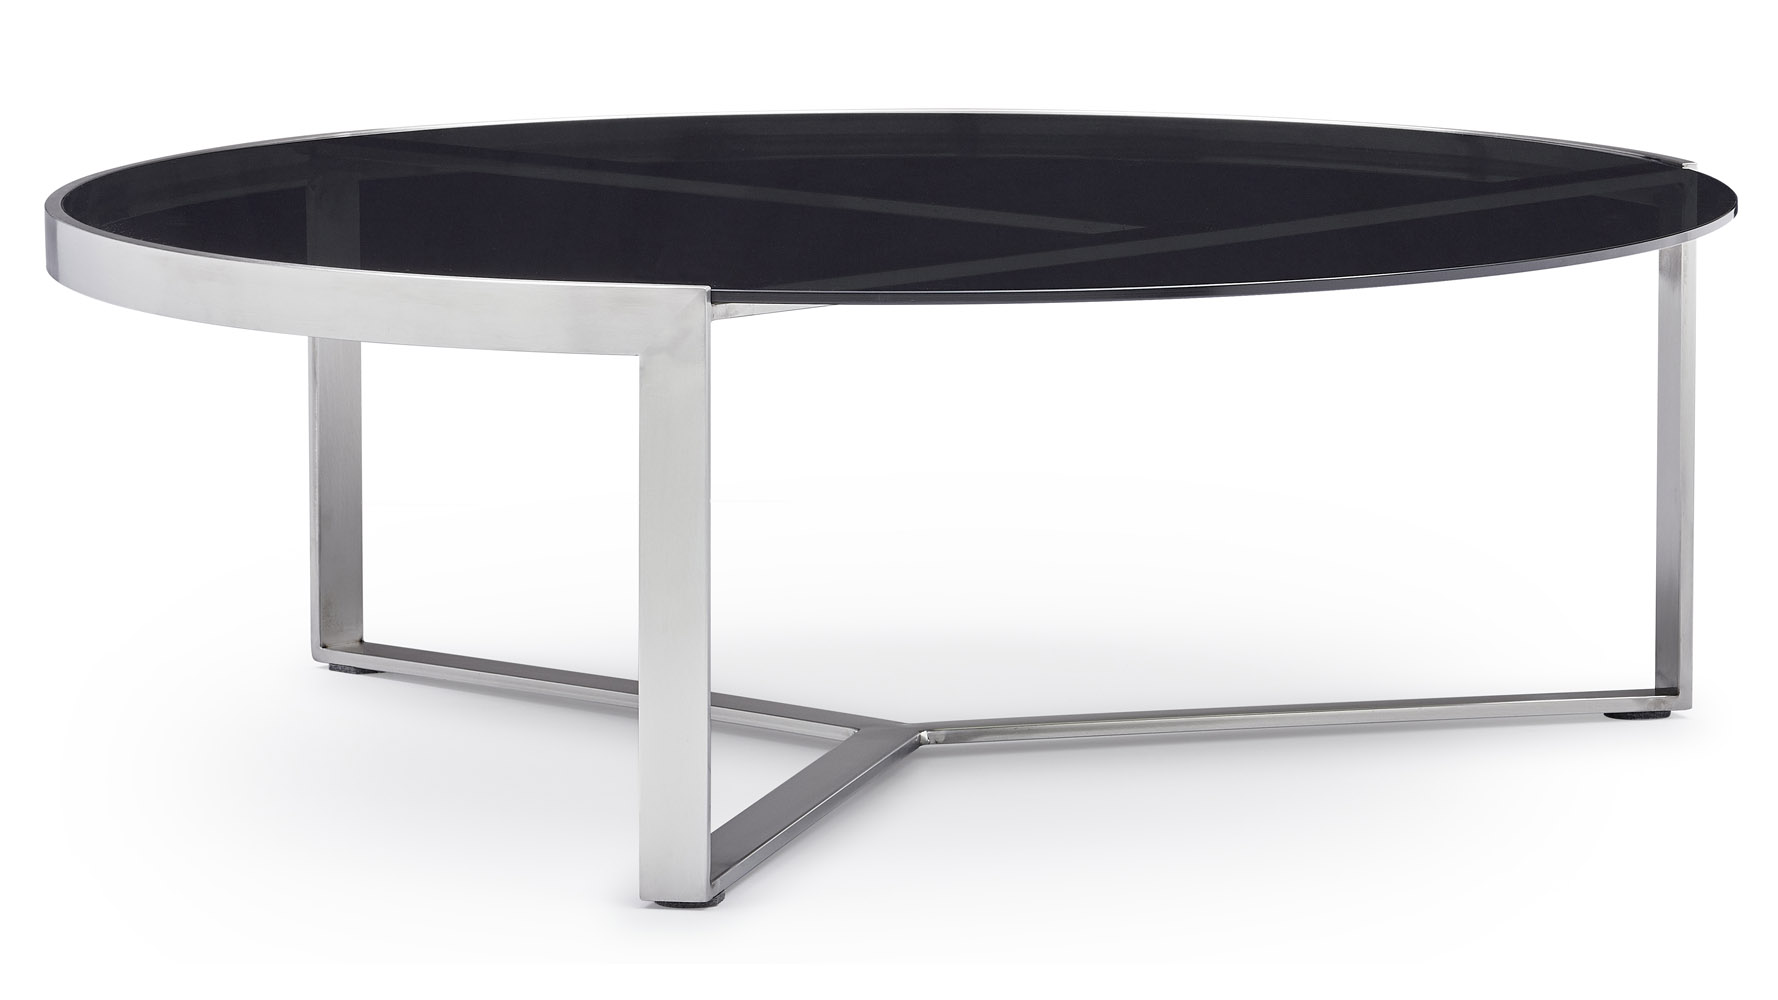 Awe Inspiring Corbe Coffee Table Lamtechconsult Wood Chair Design Ideas Lamtechconsultcom